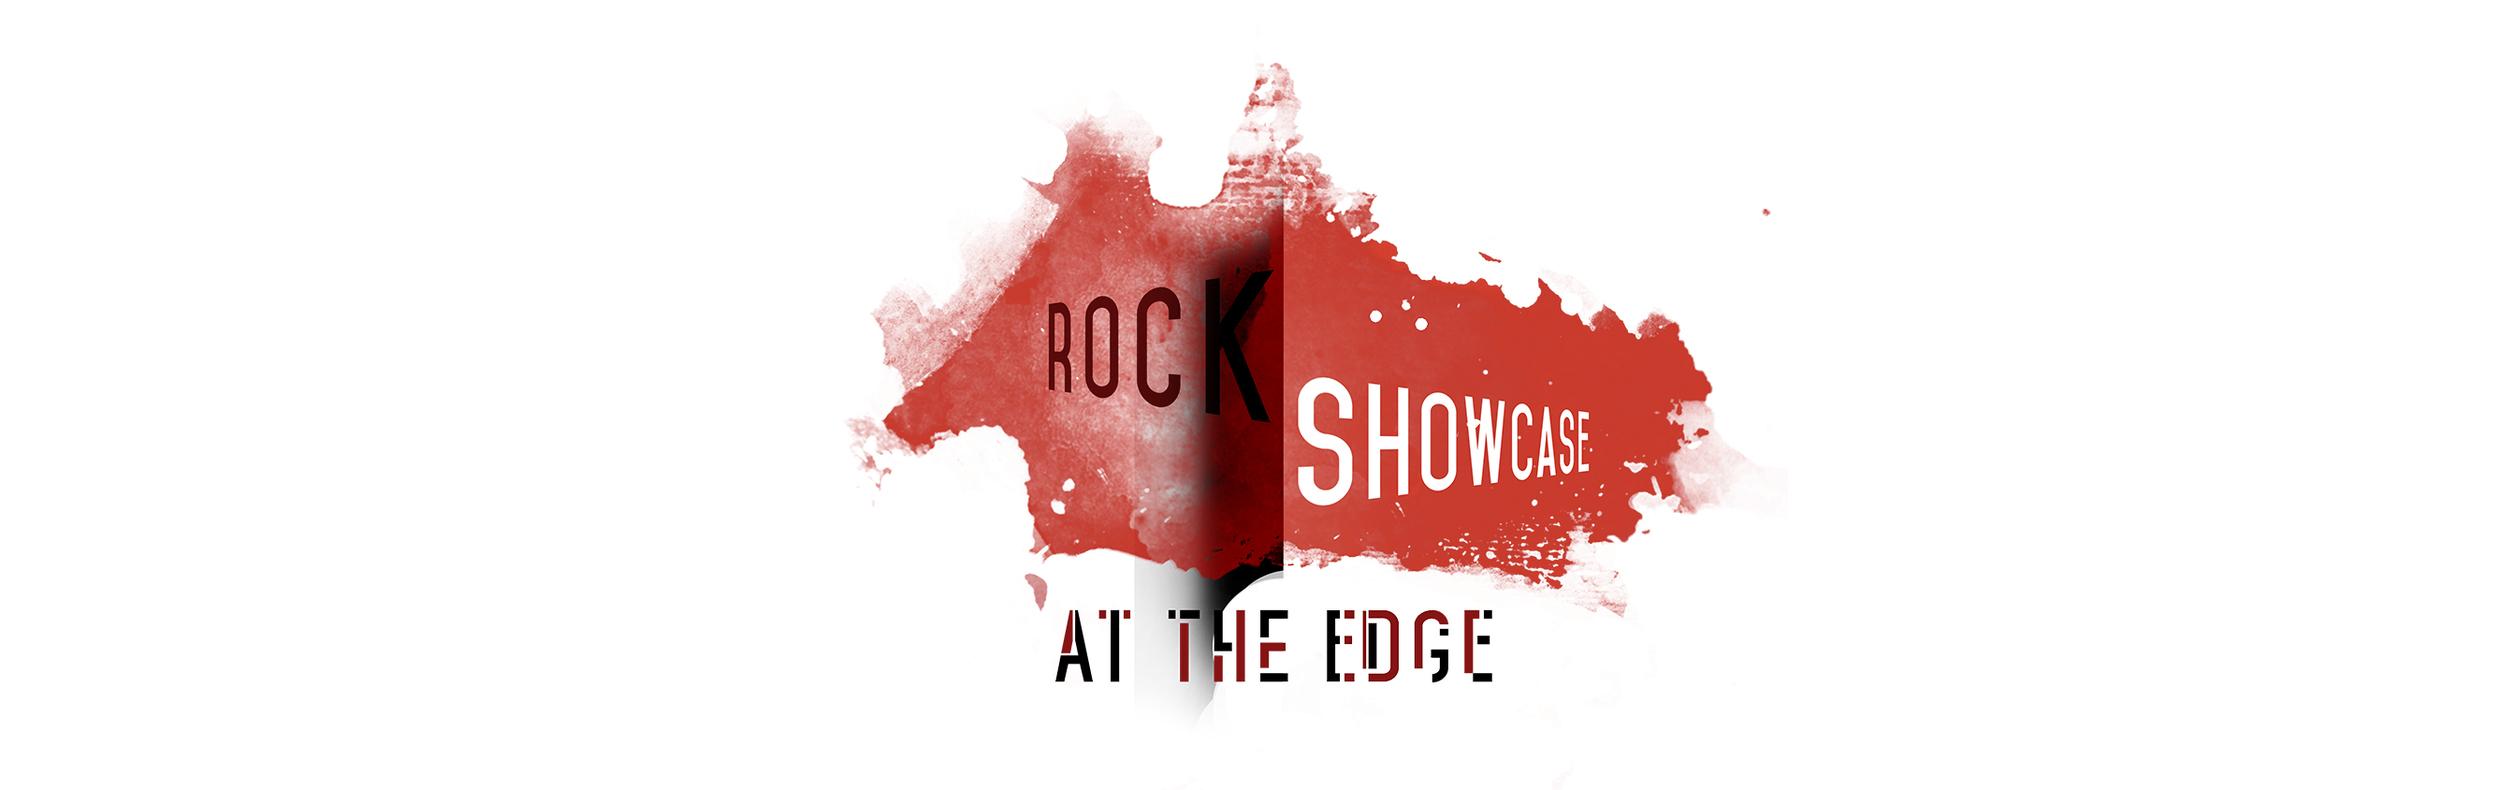 Rock 2016 Header Image .jpg